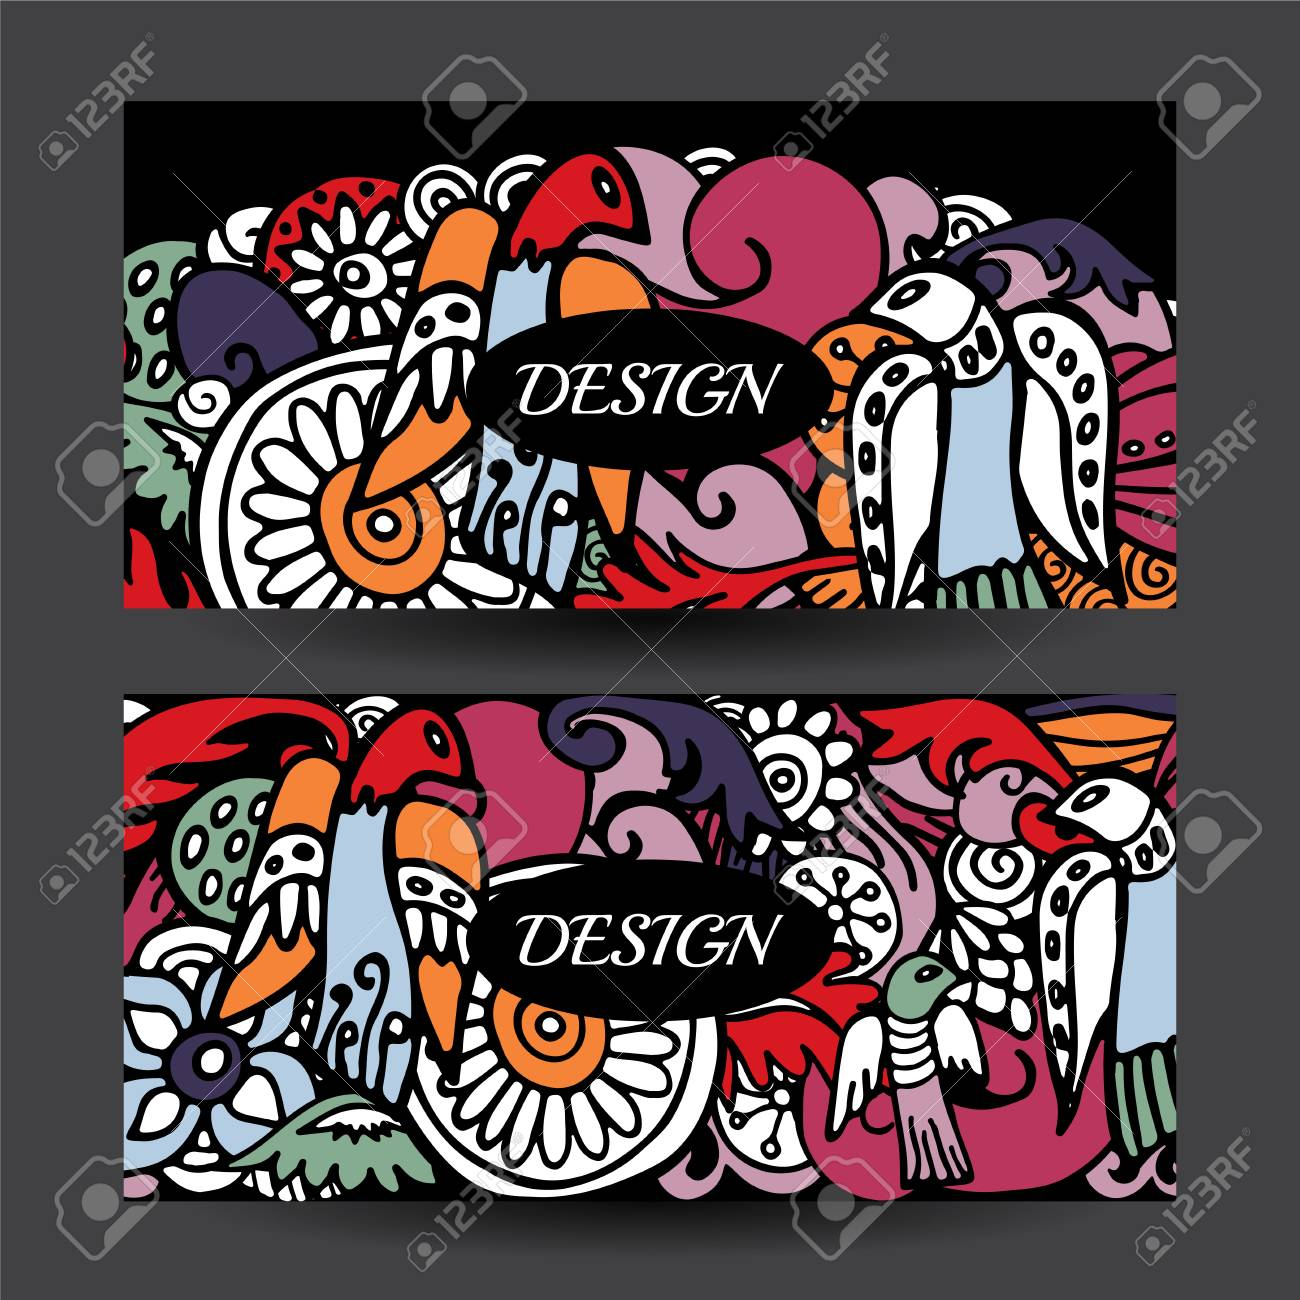 1300x1300 Stock Vector Cartoon Hand Draw Colorful Corporate Identity